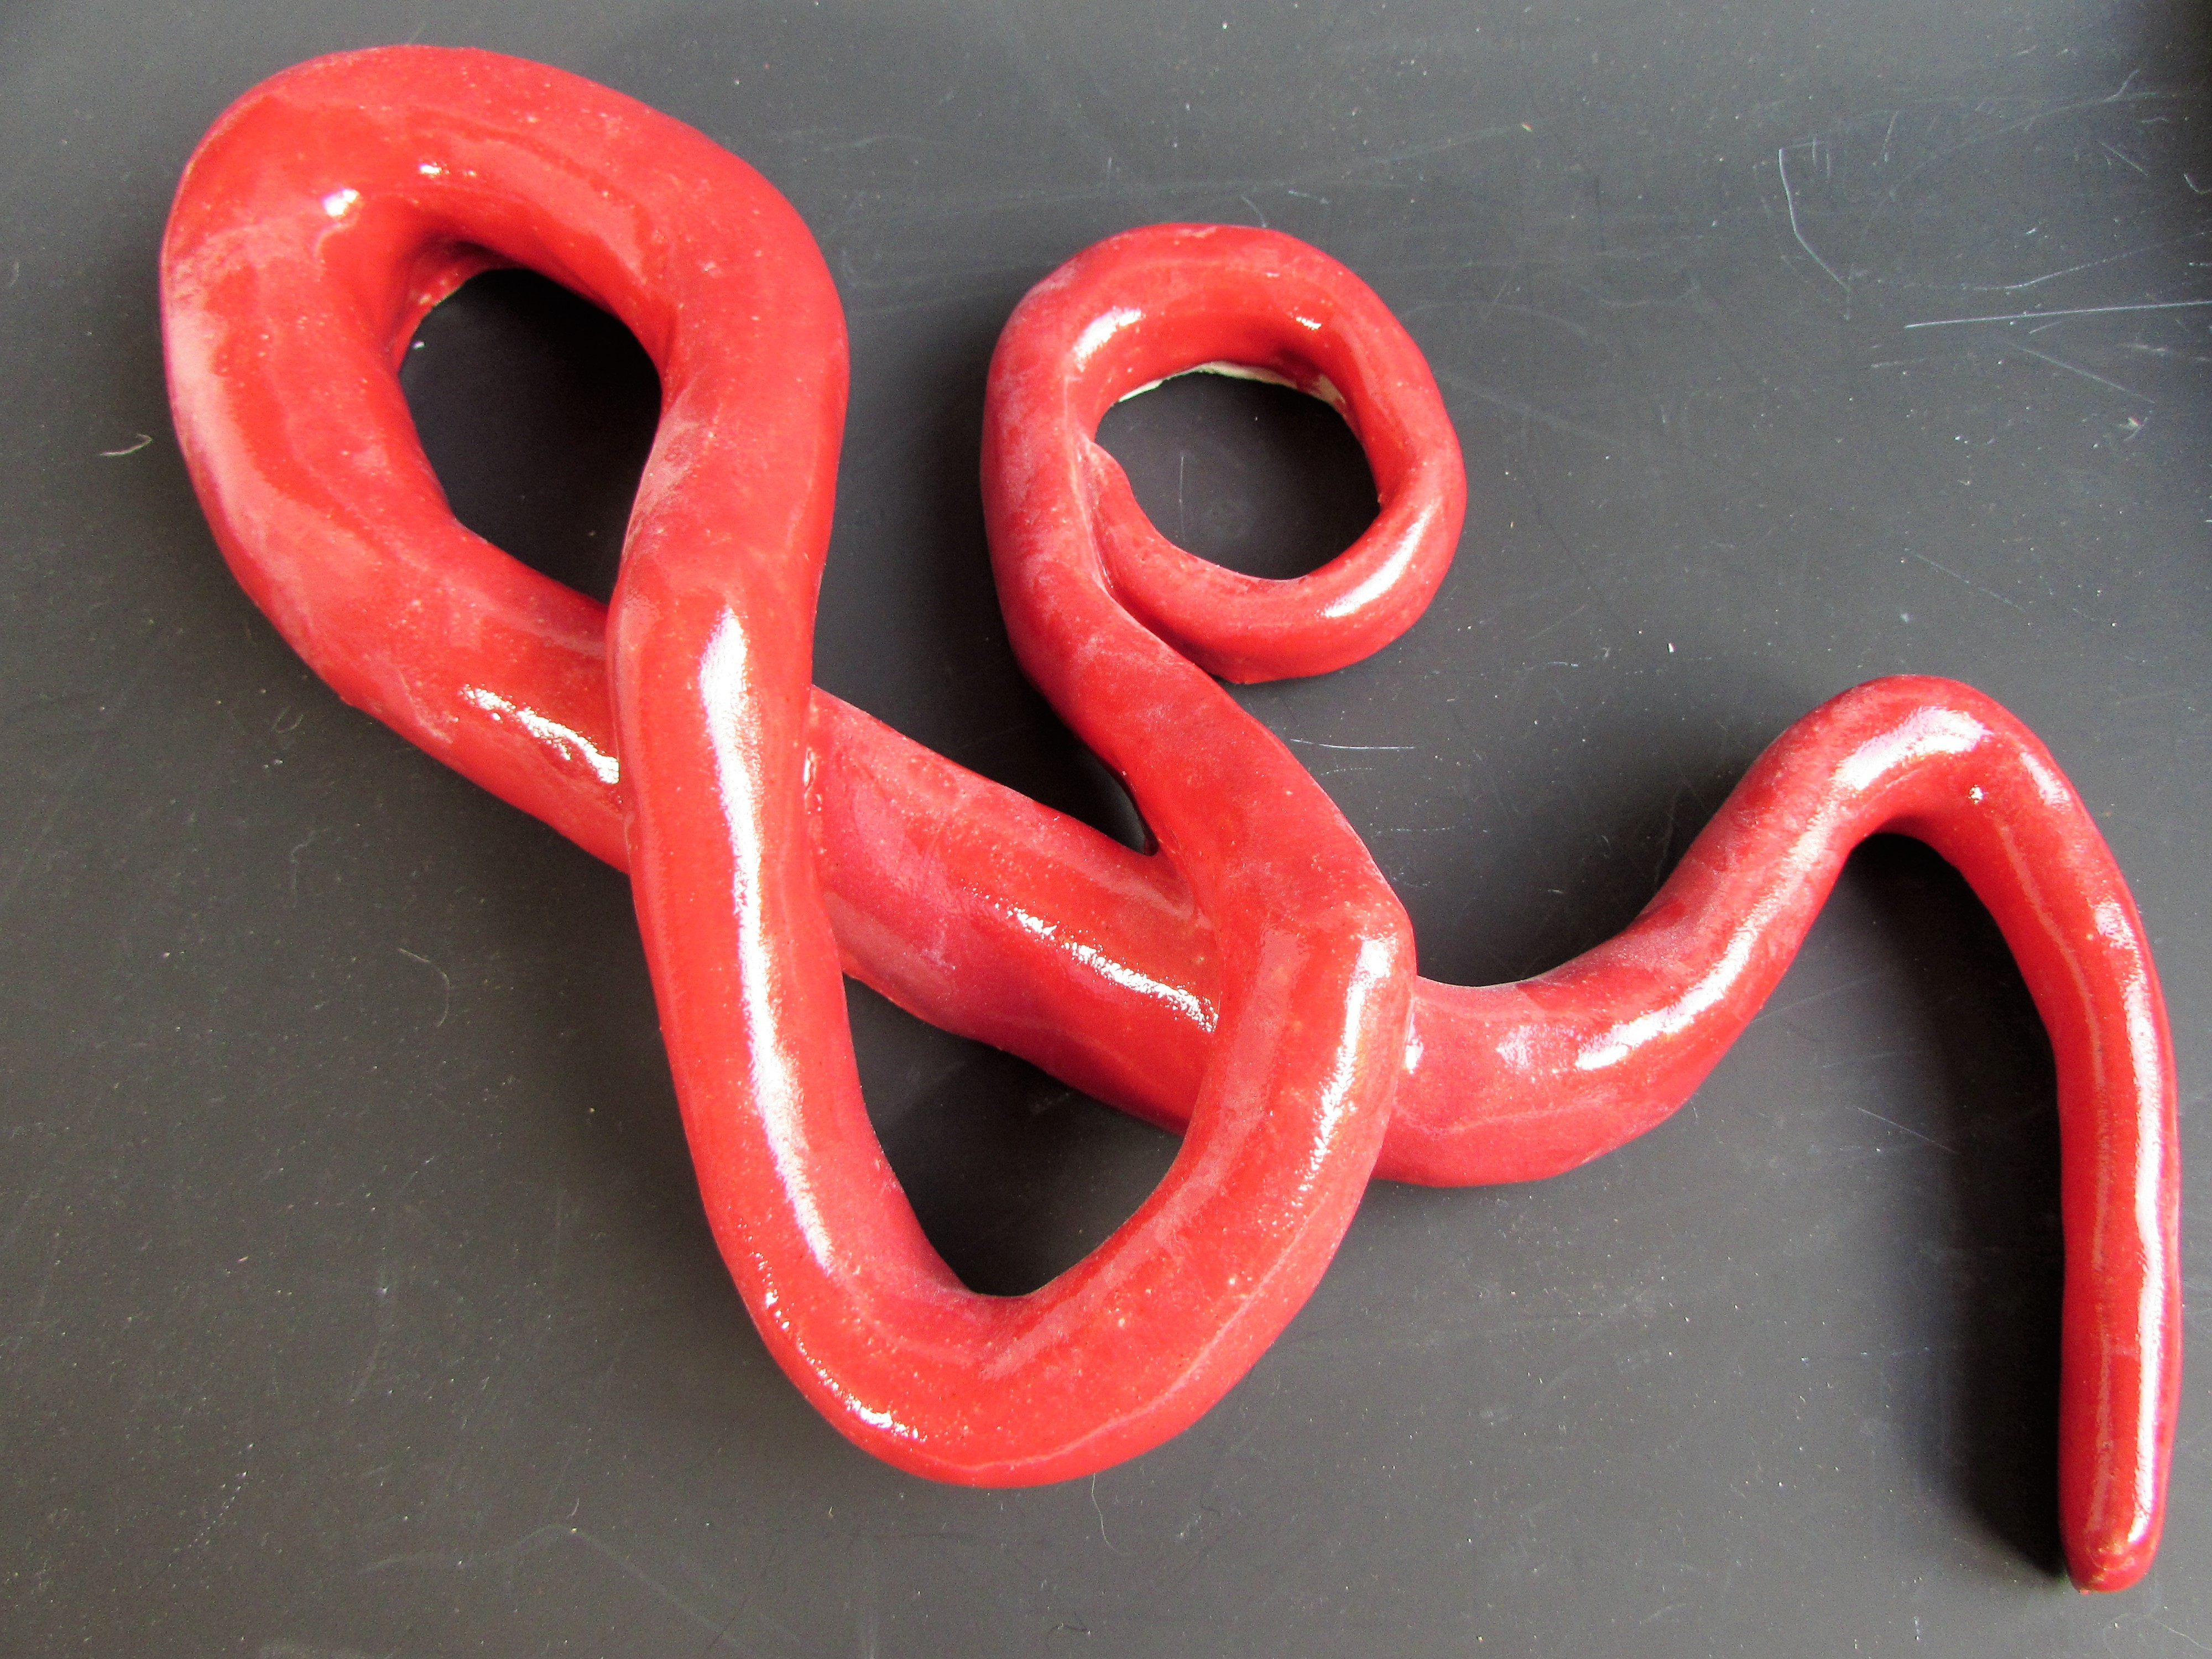 Helen Birnbaum OUTBREAK 8 60cm x 35cm Ebola